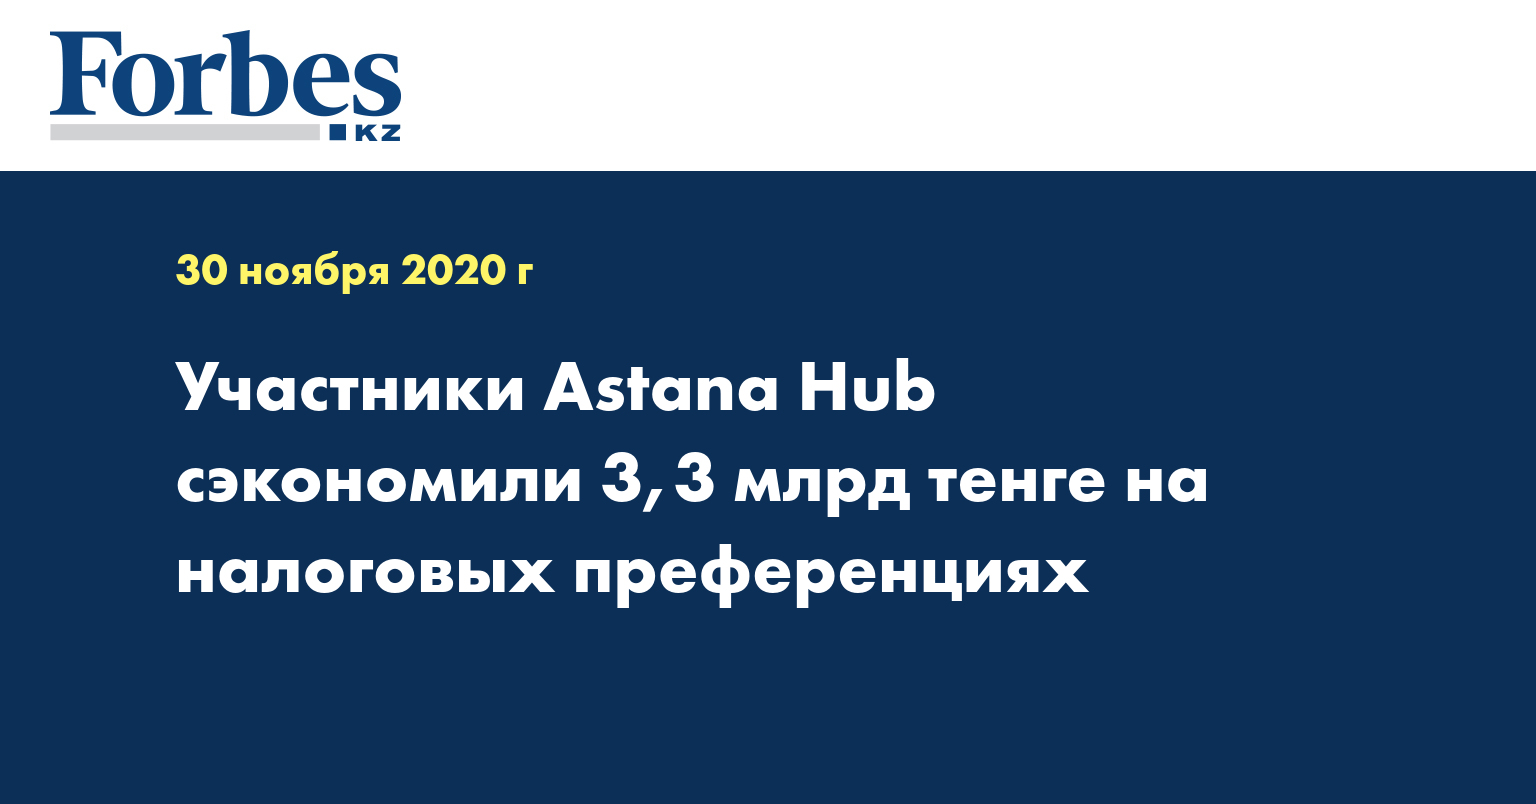 Участники Astana Hub сэкономили 3,3 млрд тенге на налоговых преференциях